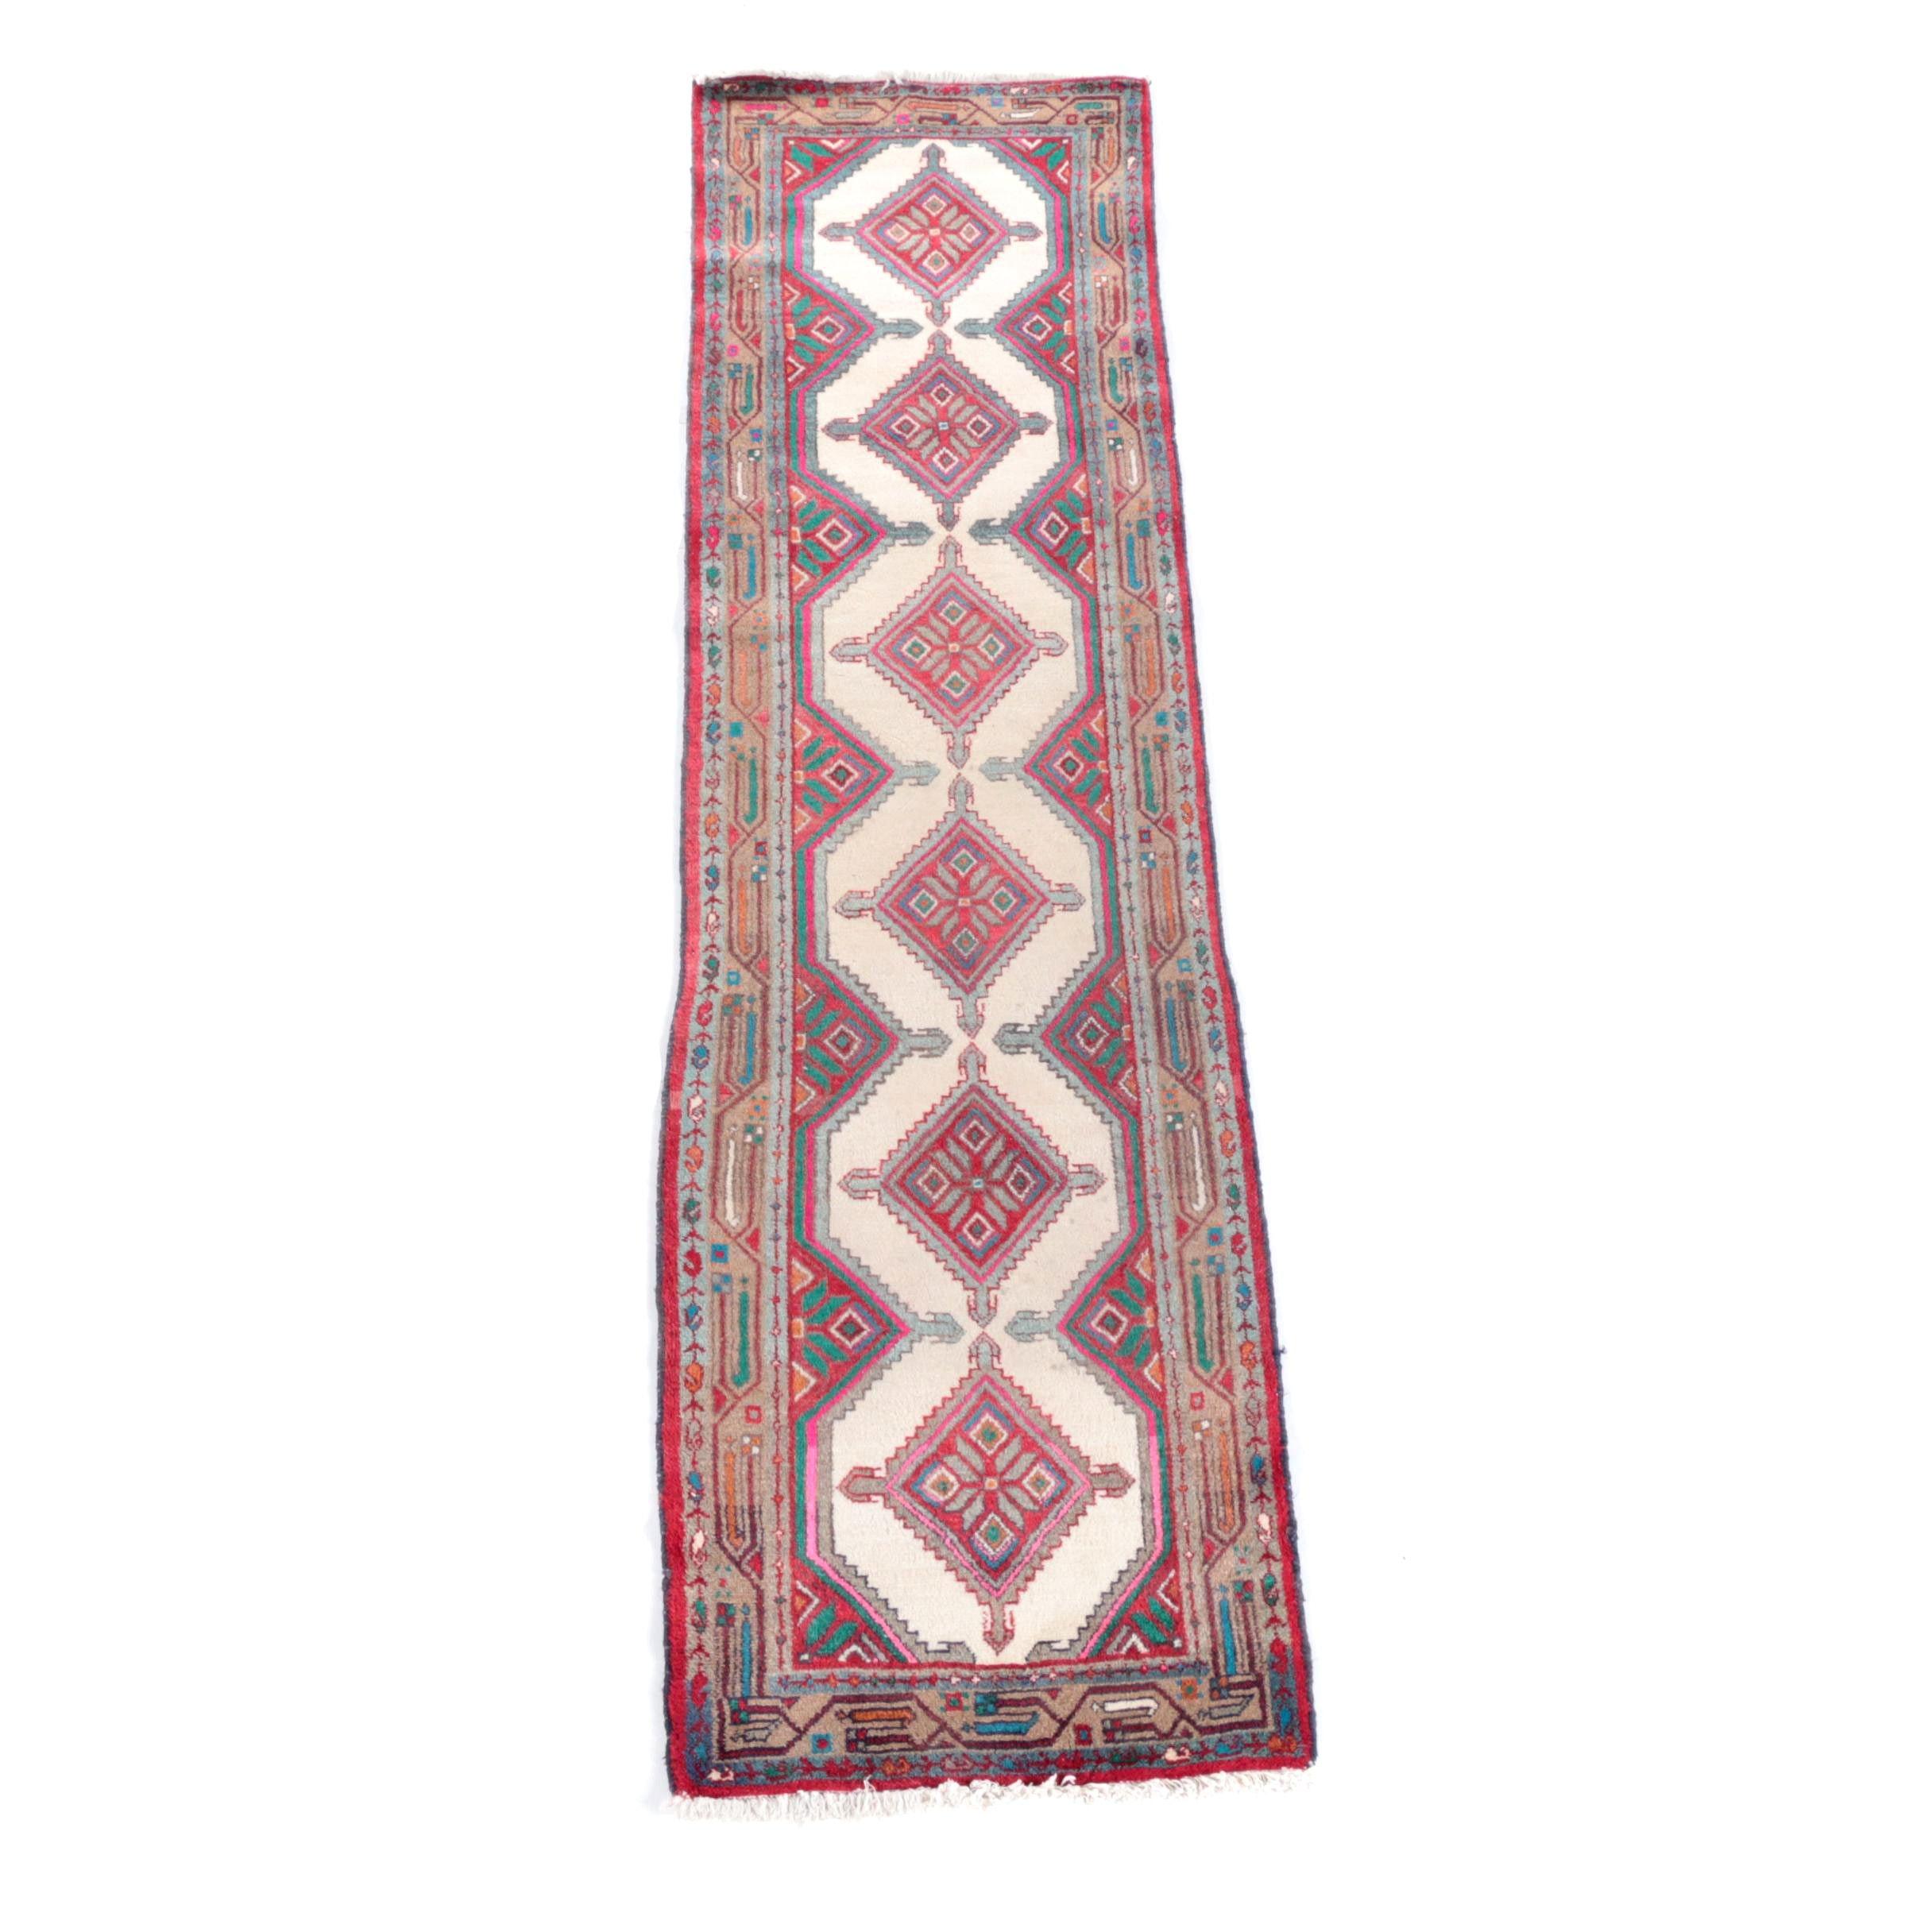 A hand-knotted Persian Seraband Wool Carpet Runner